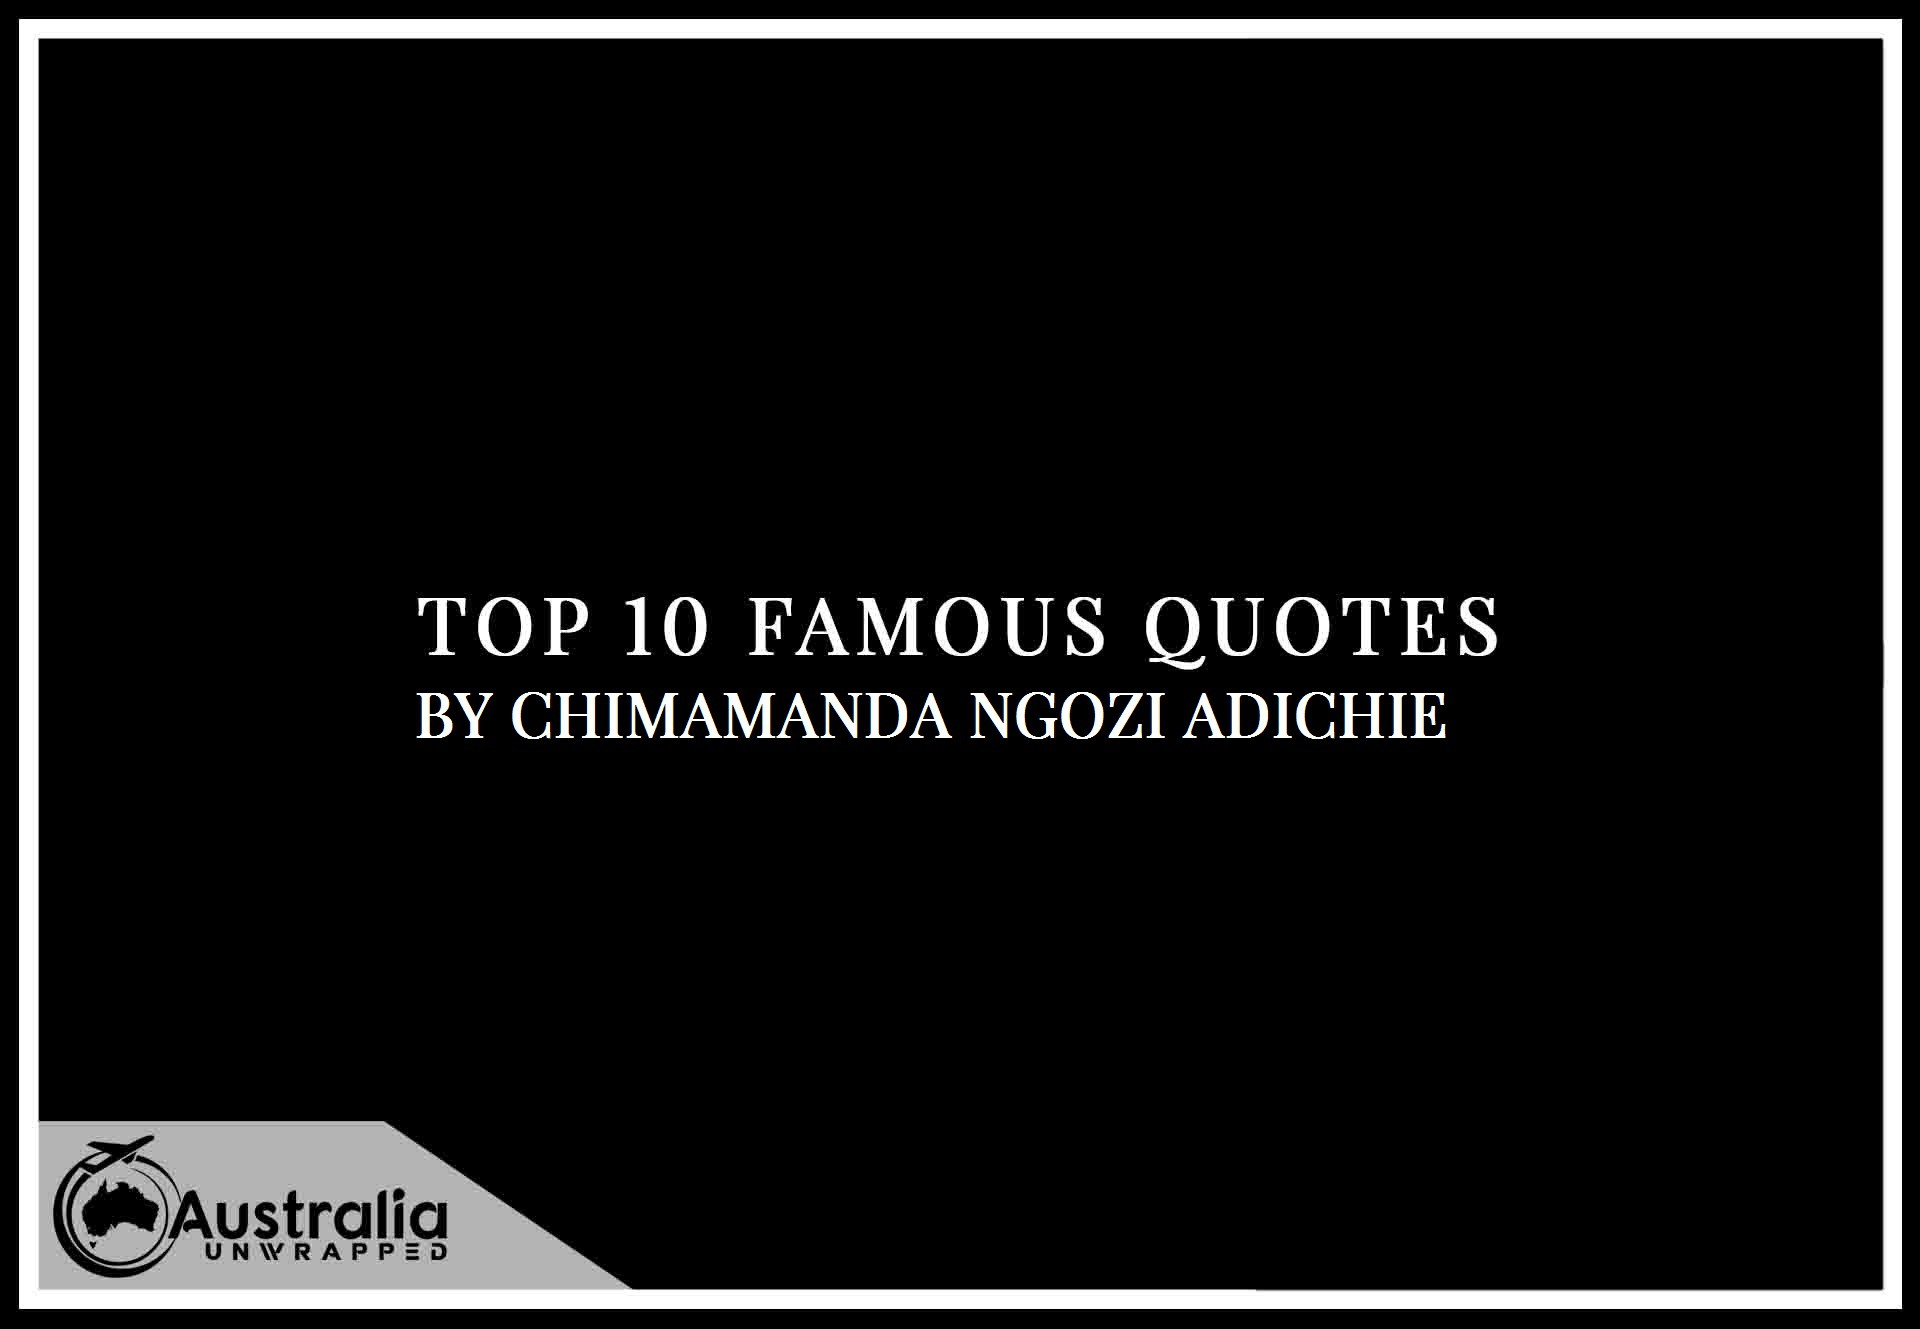 Chimamanda Ngozi Adichie's Top 10 Popular and Famous Quotes